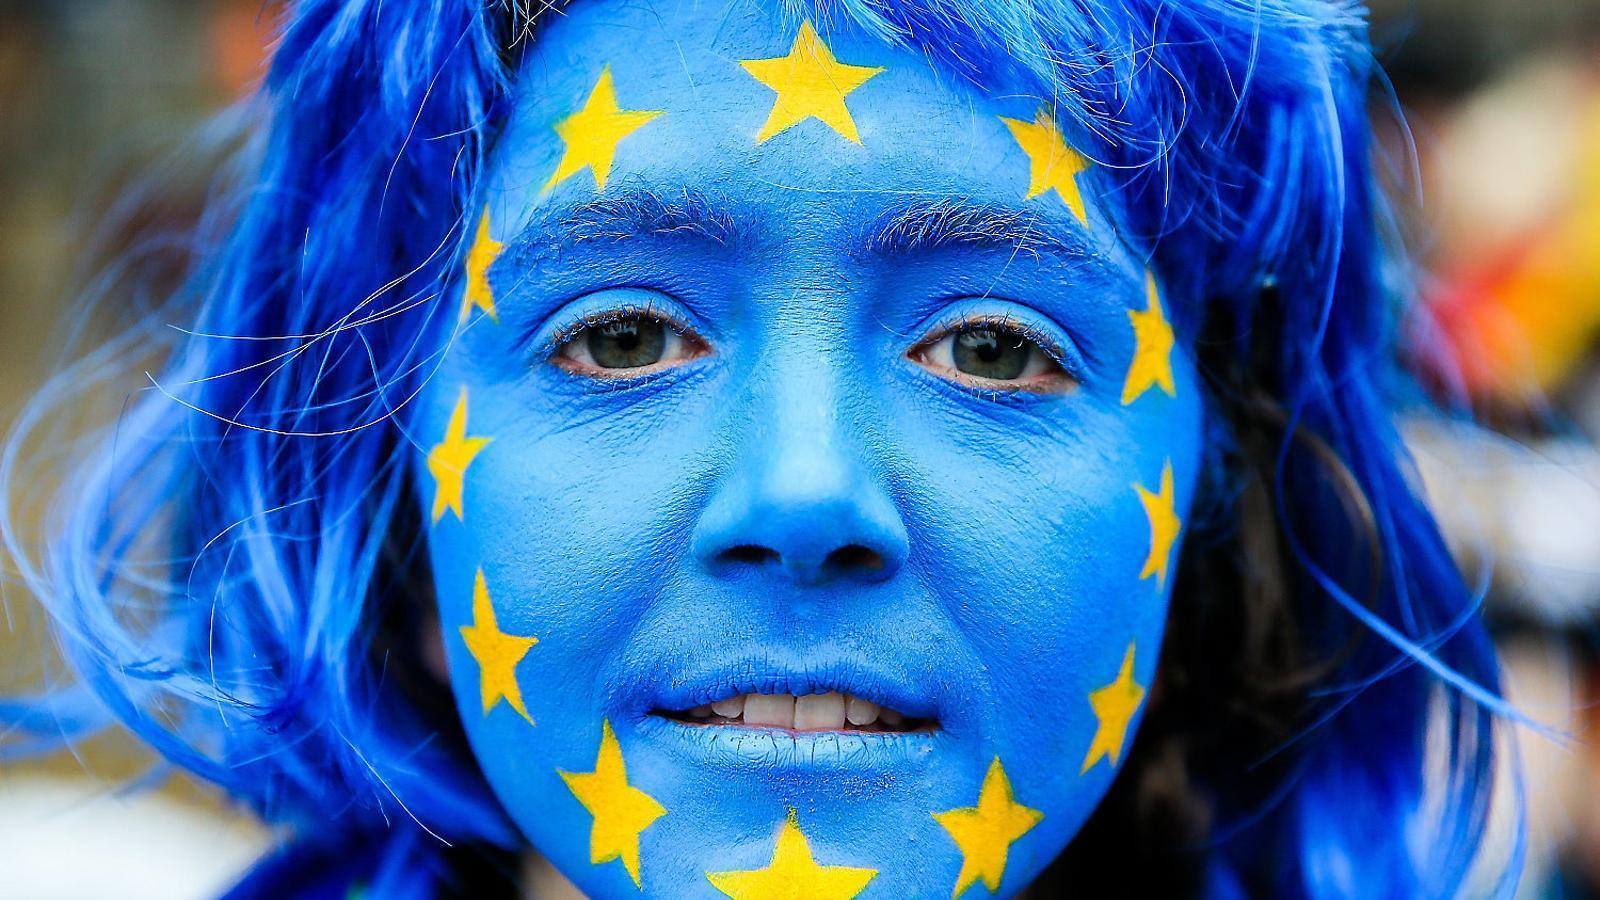 Una manifestant durant una protesta a Brussel·les.